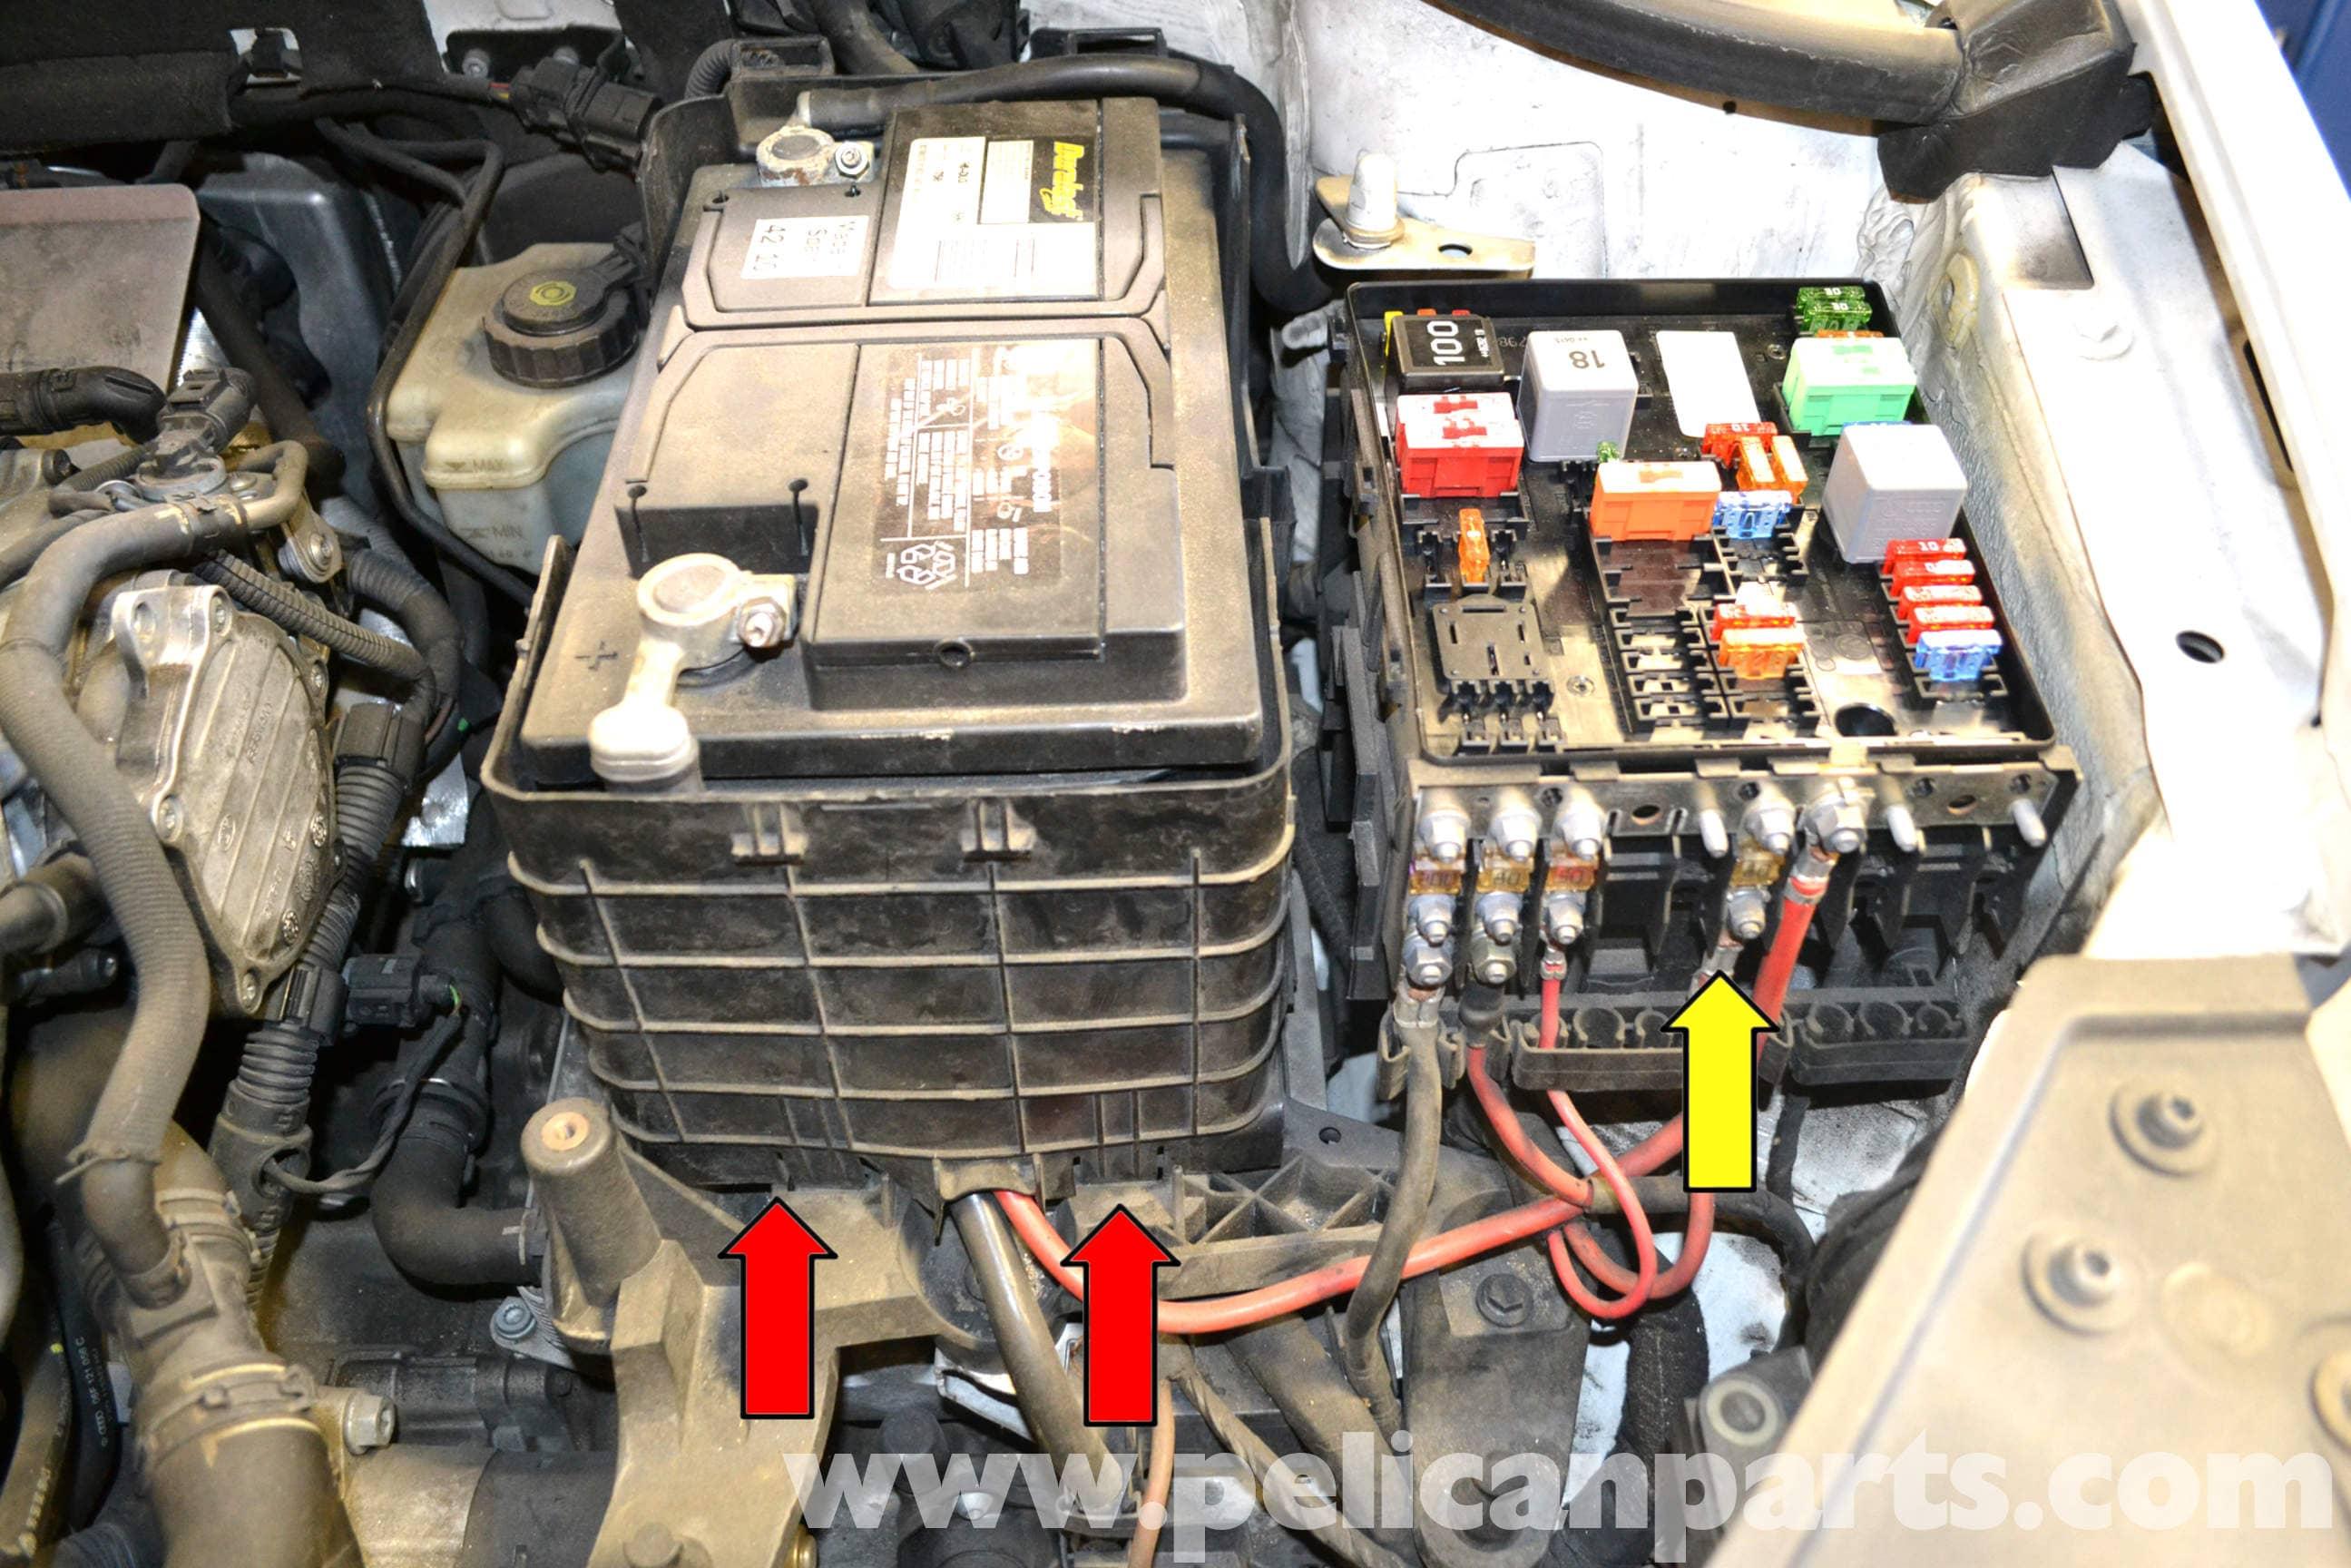 volkswagen golf gti mk  transmission oil cooler replacement   pelican parts diy